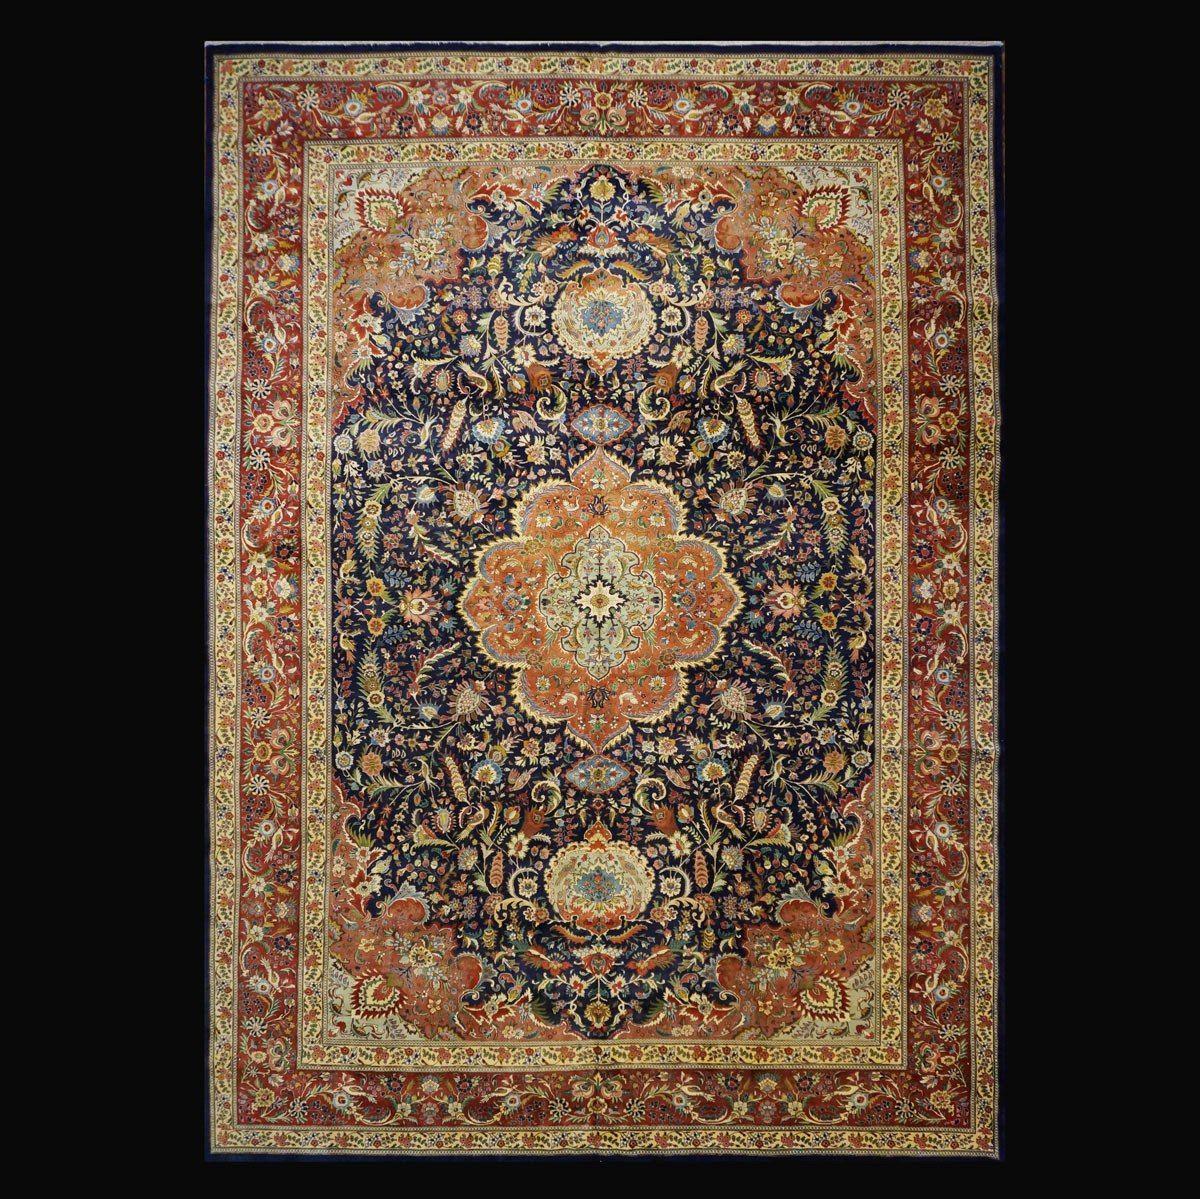 1140951 Antique Persian Tabriz 12 1x18 6 Circa 1940 Fine Rugs Rug Store Rugs